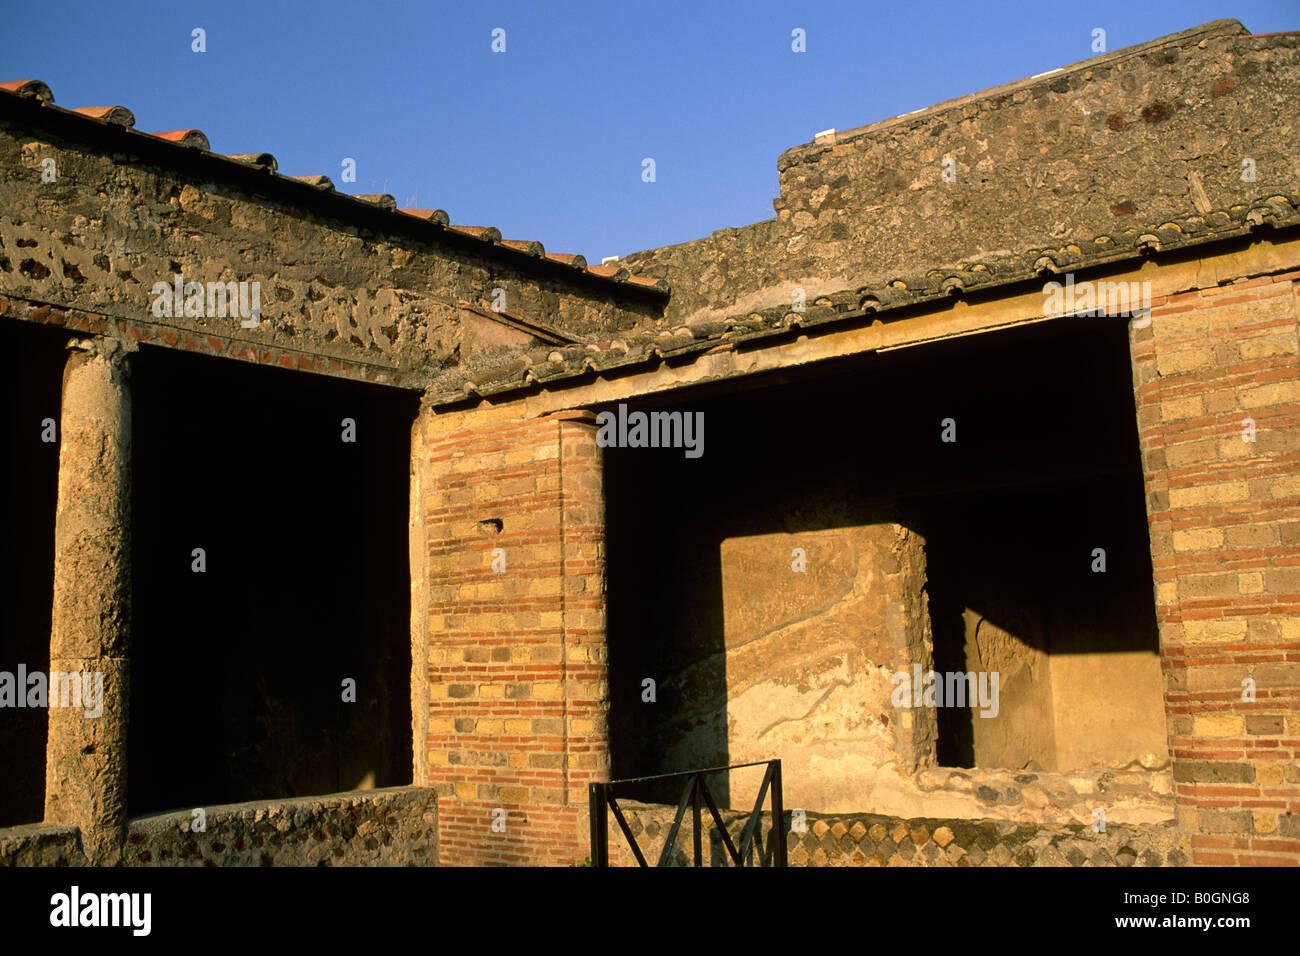 italy, campania, pompeii, villa dei misteri - Stock Image